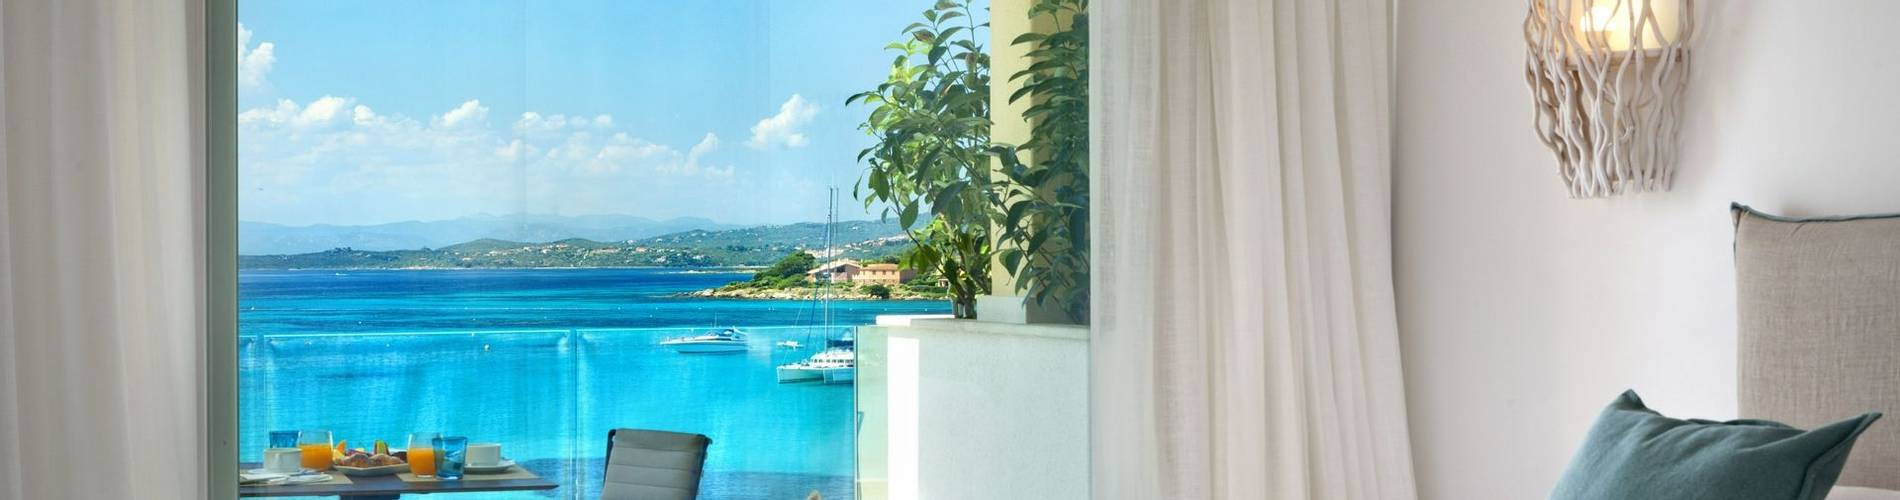 Pool Suite - Gabbiano Azzurro Hotel Sardinia2.jpg